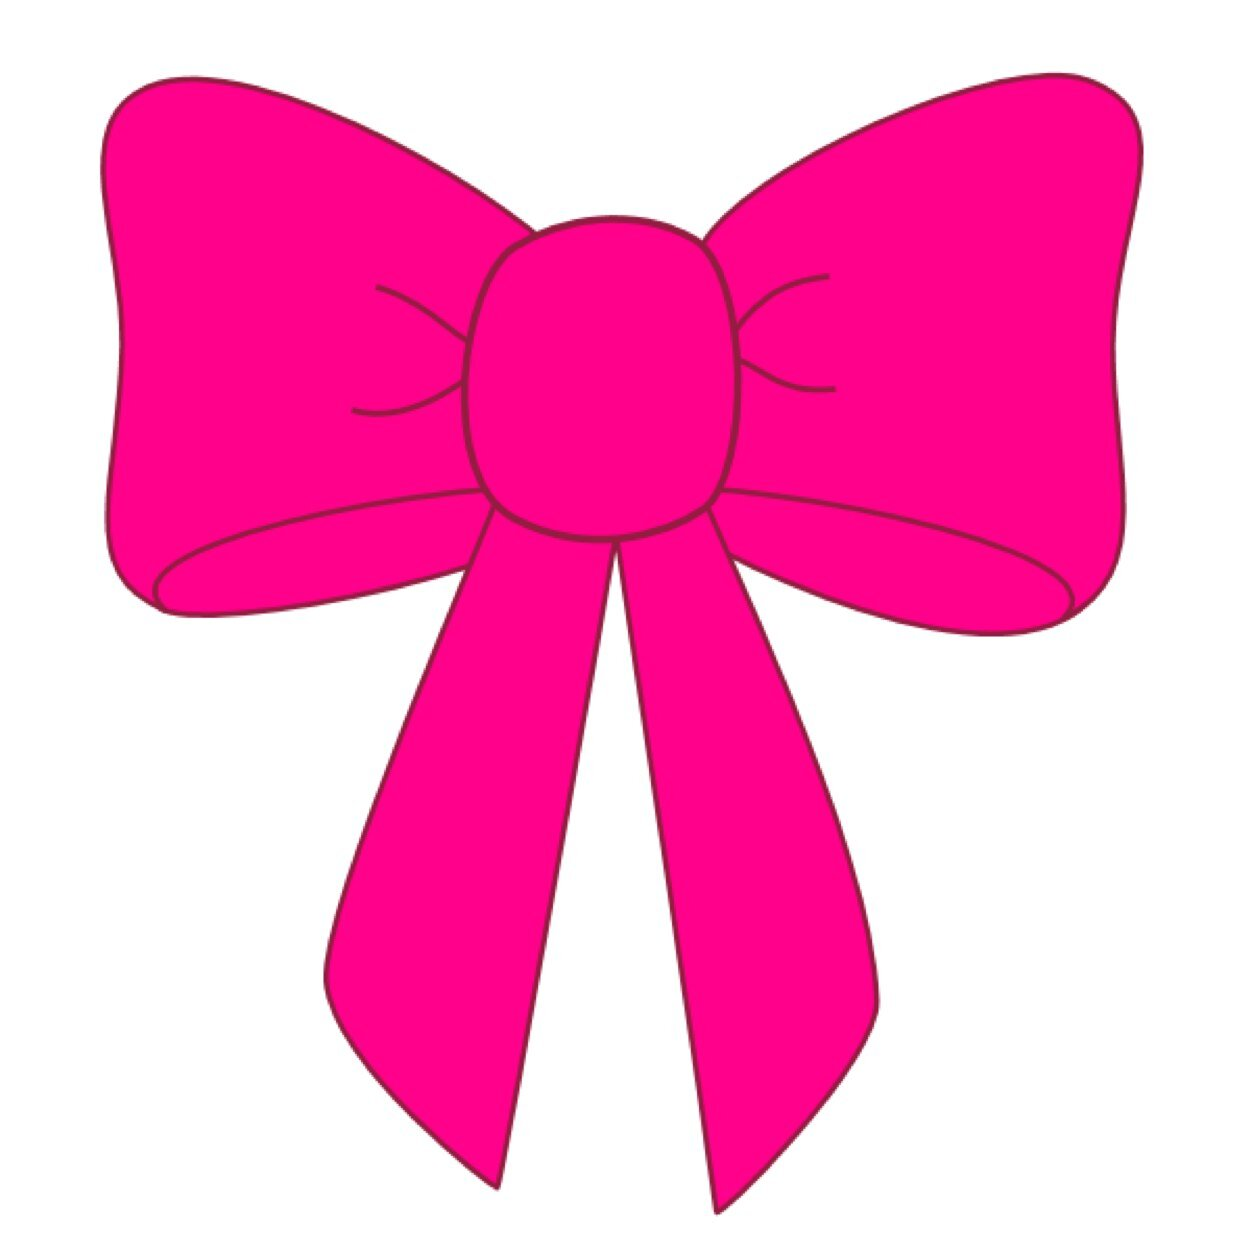 Bow girly. Pink girl pinkbowgirl twitter